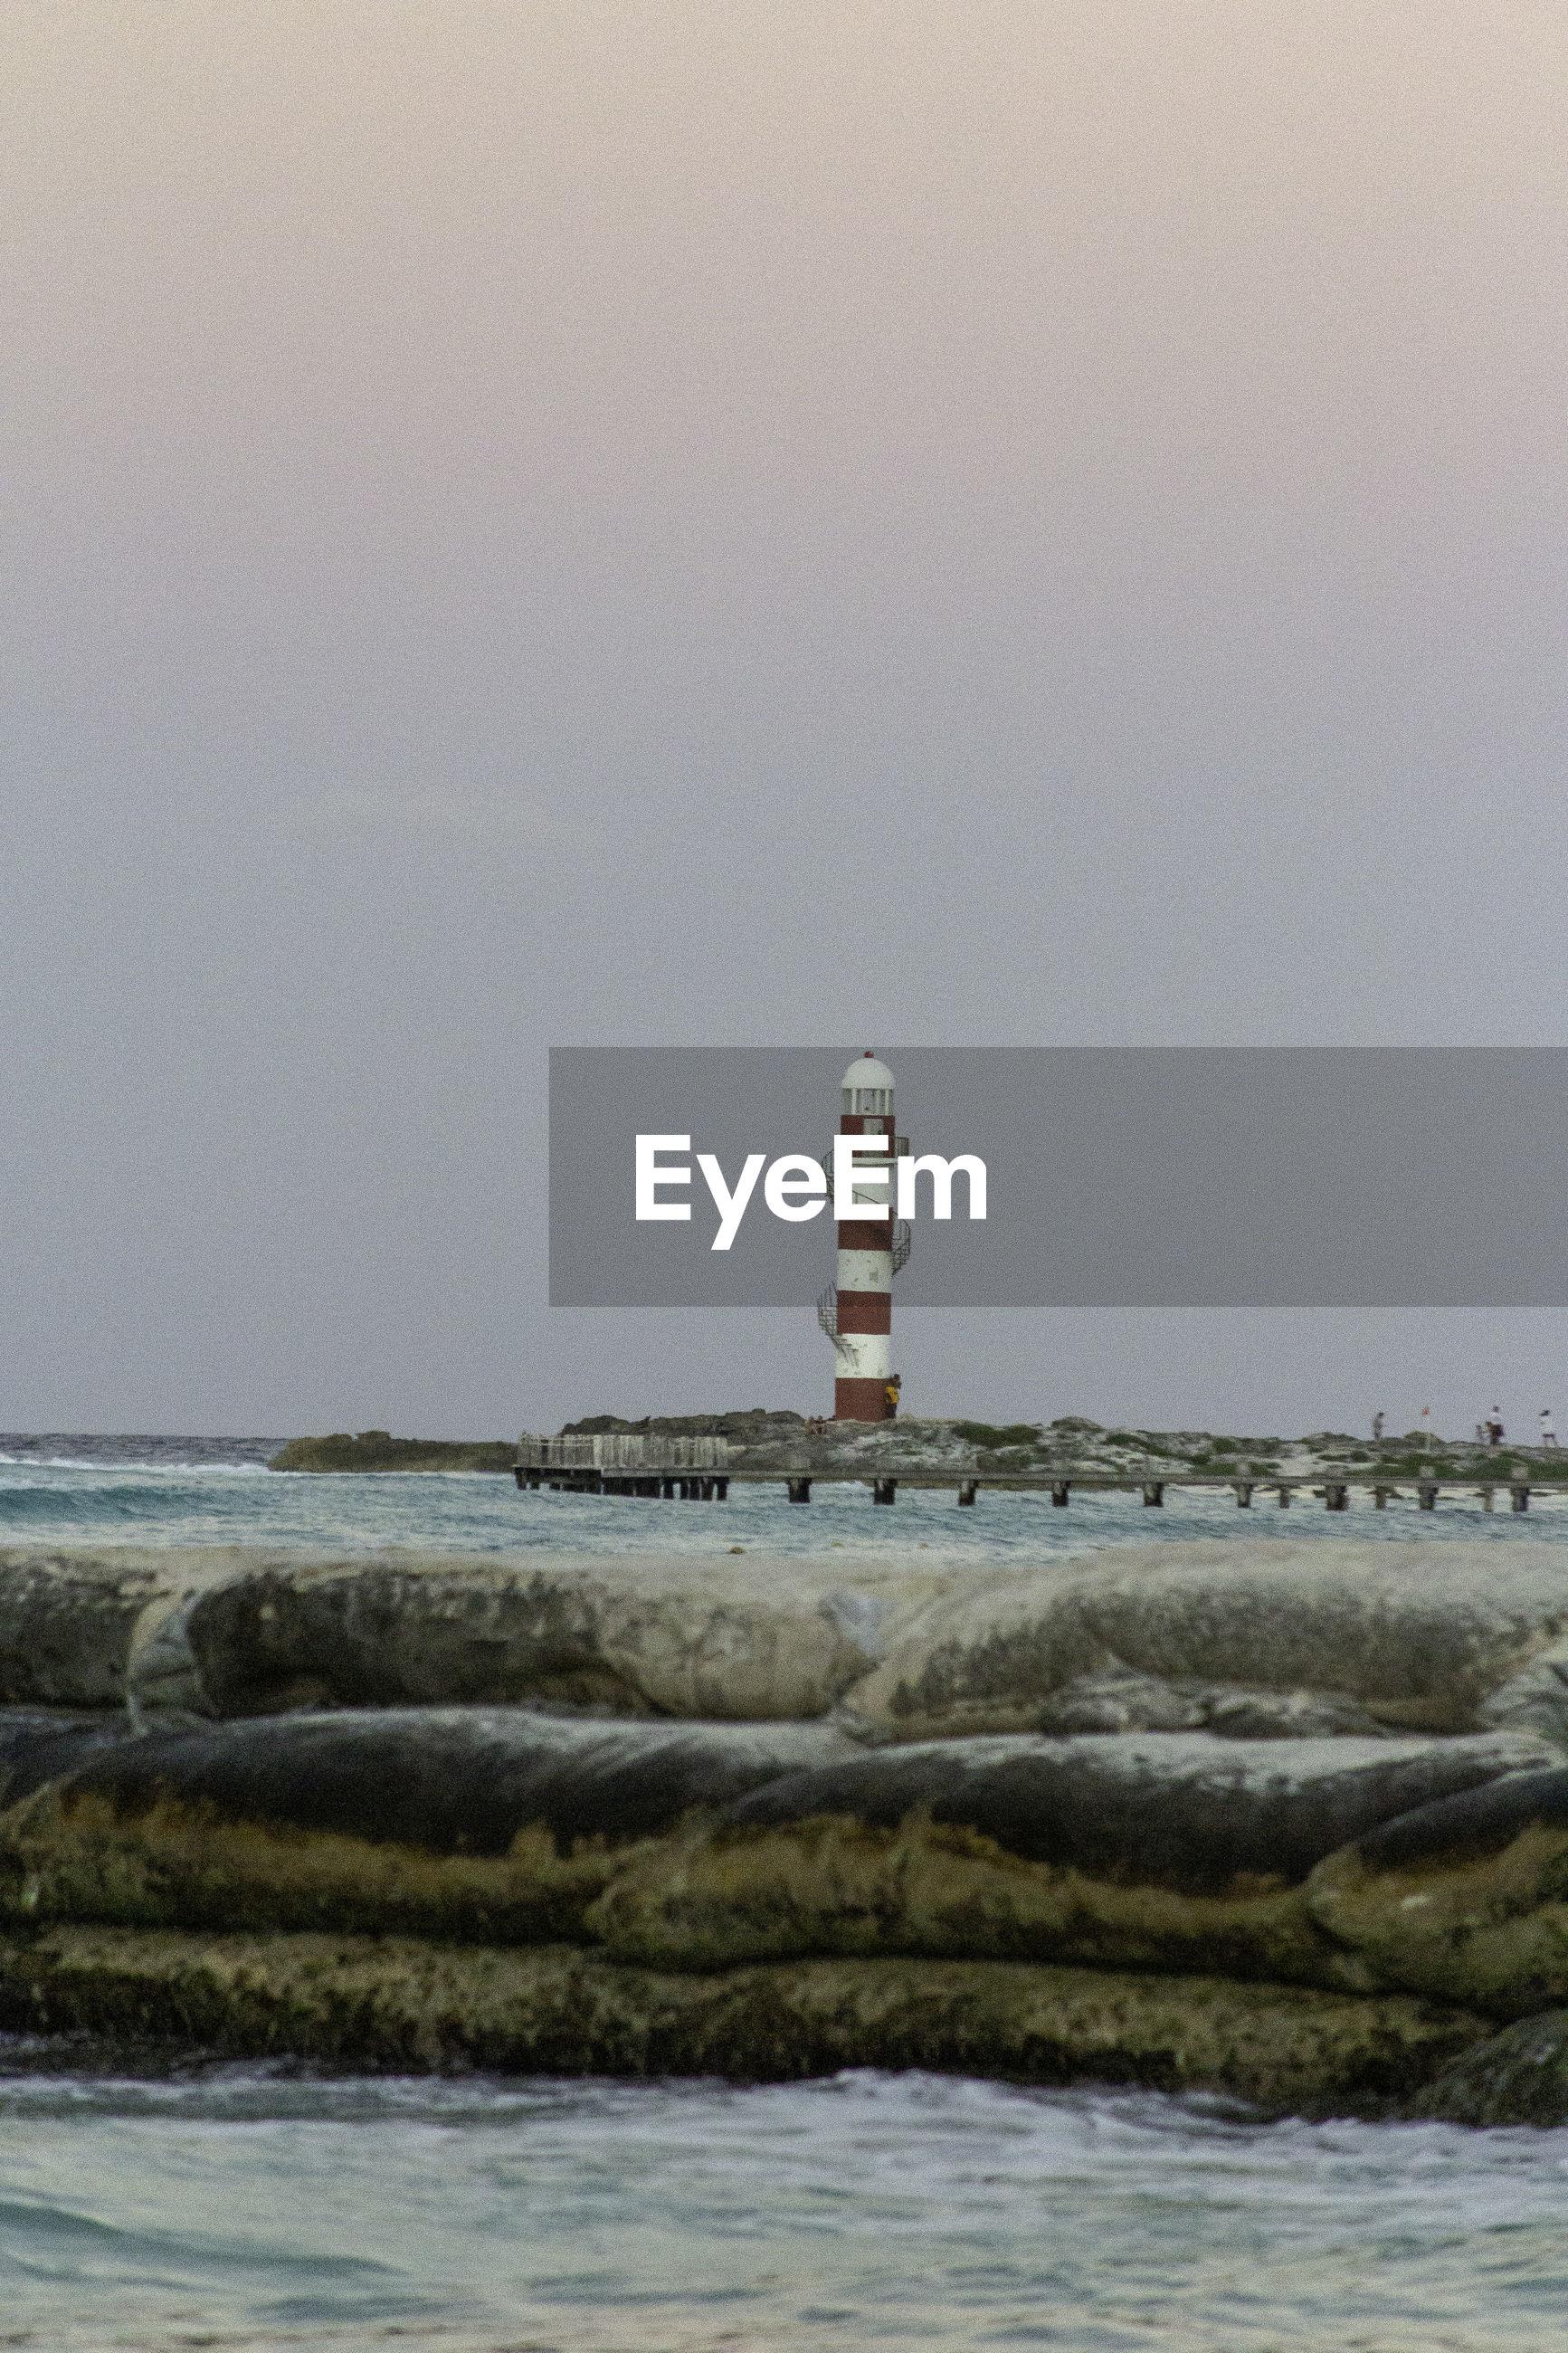 Lighthouse by sea against sky | ID: 139867099